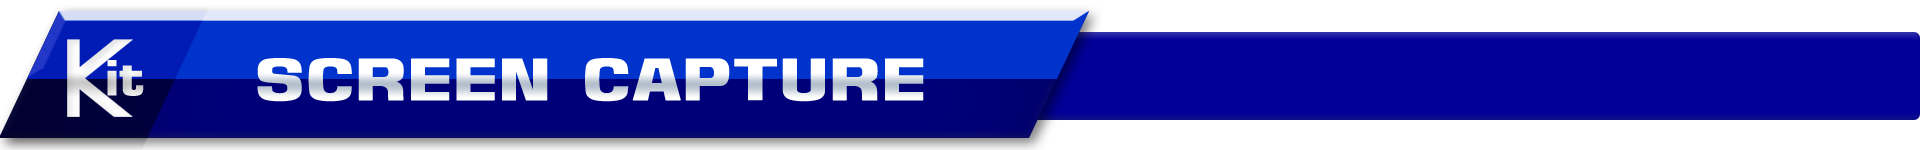 Video Example Screen Capture